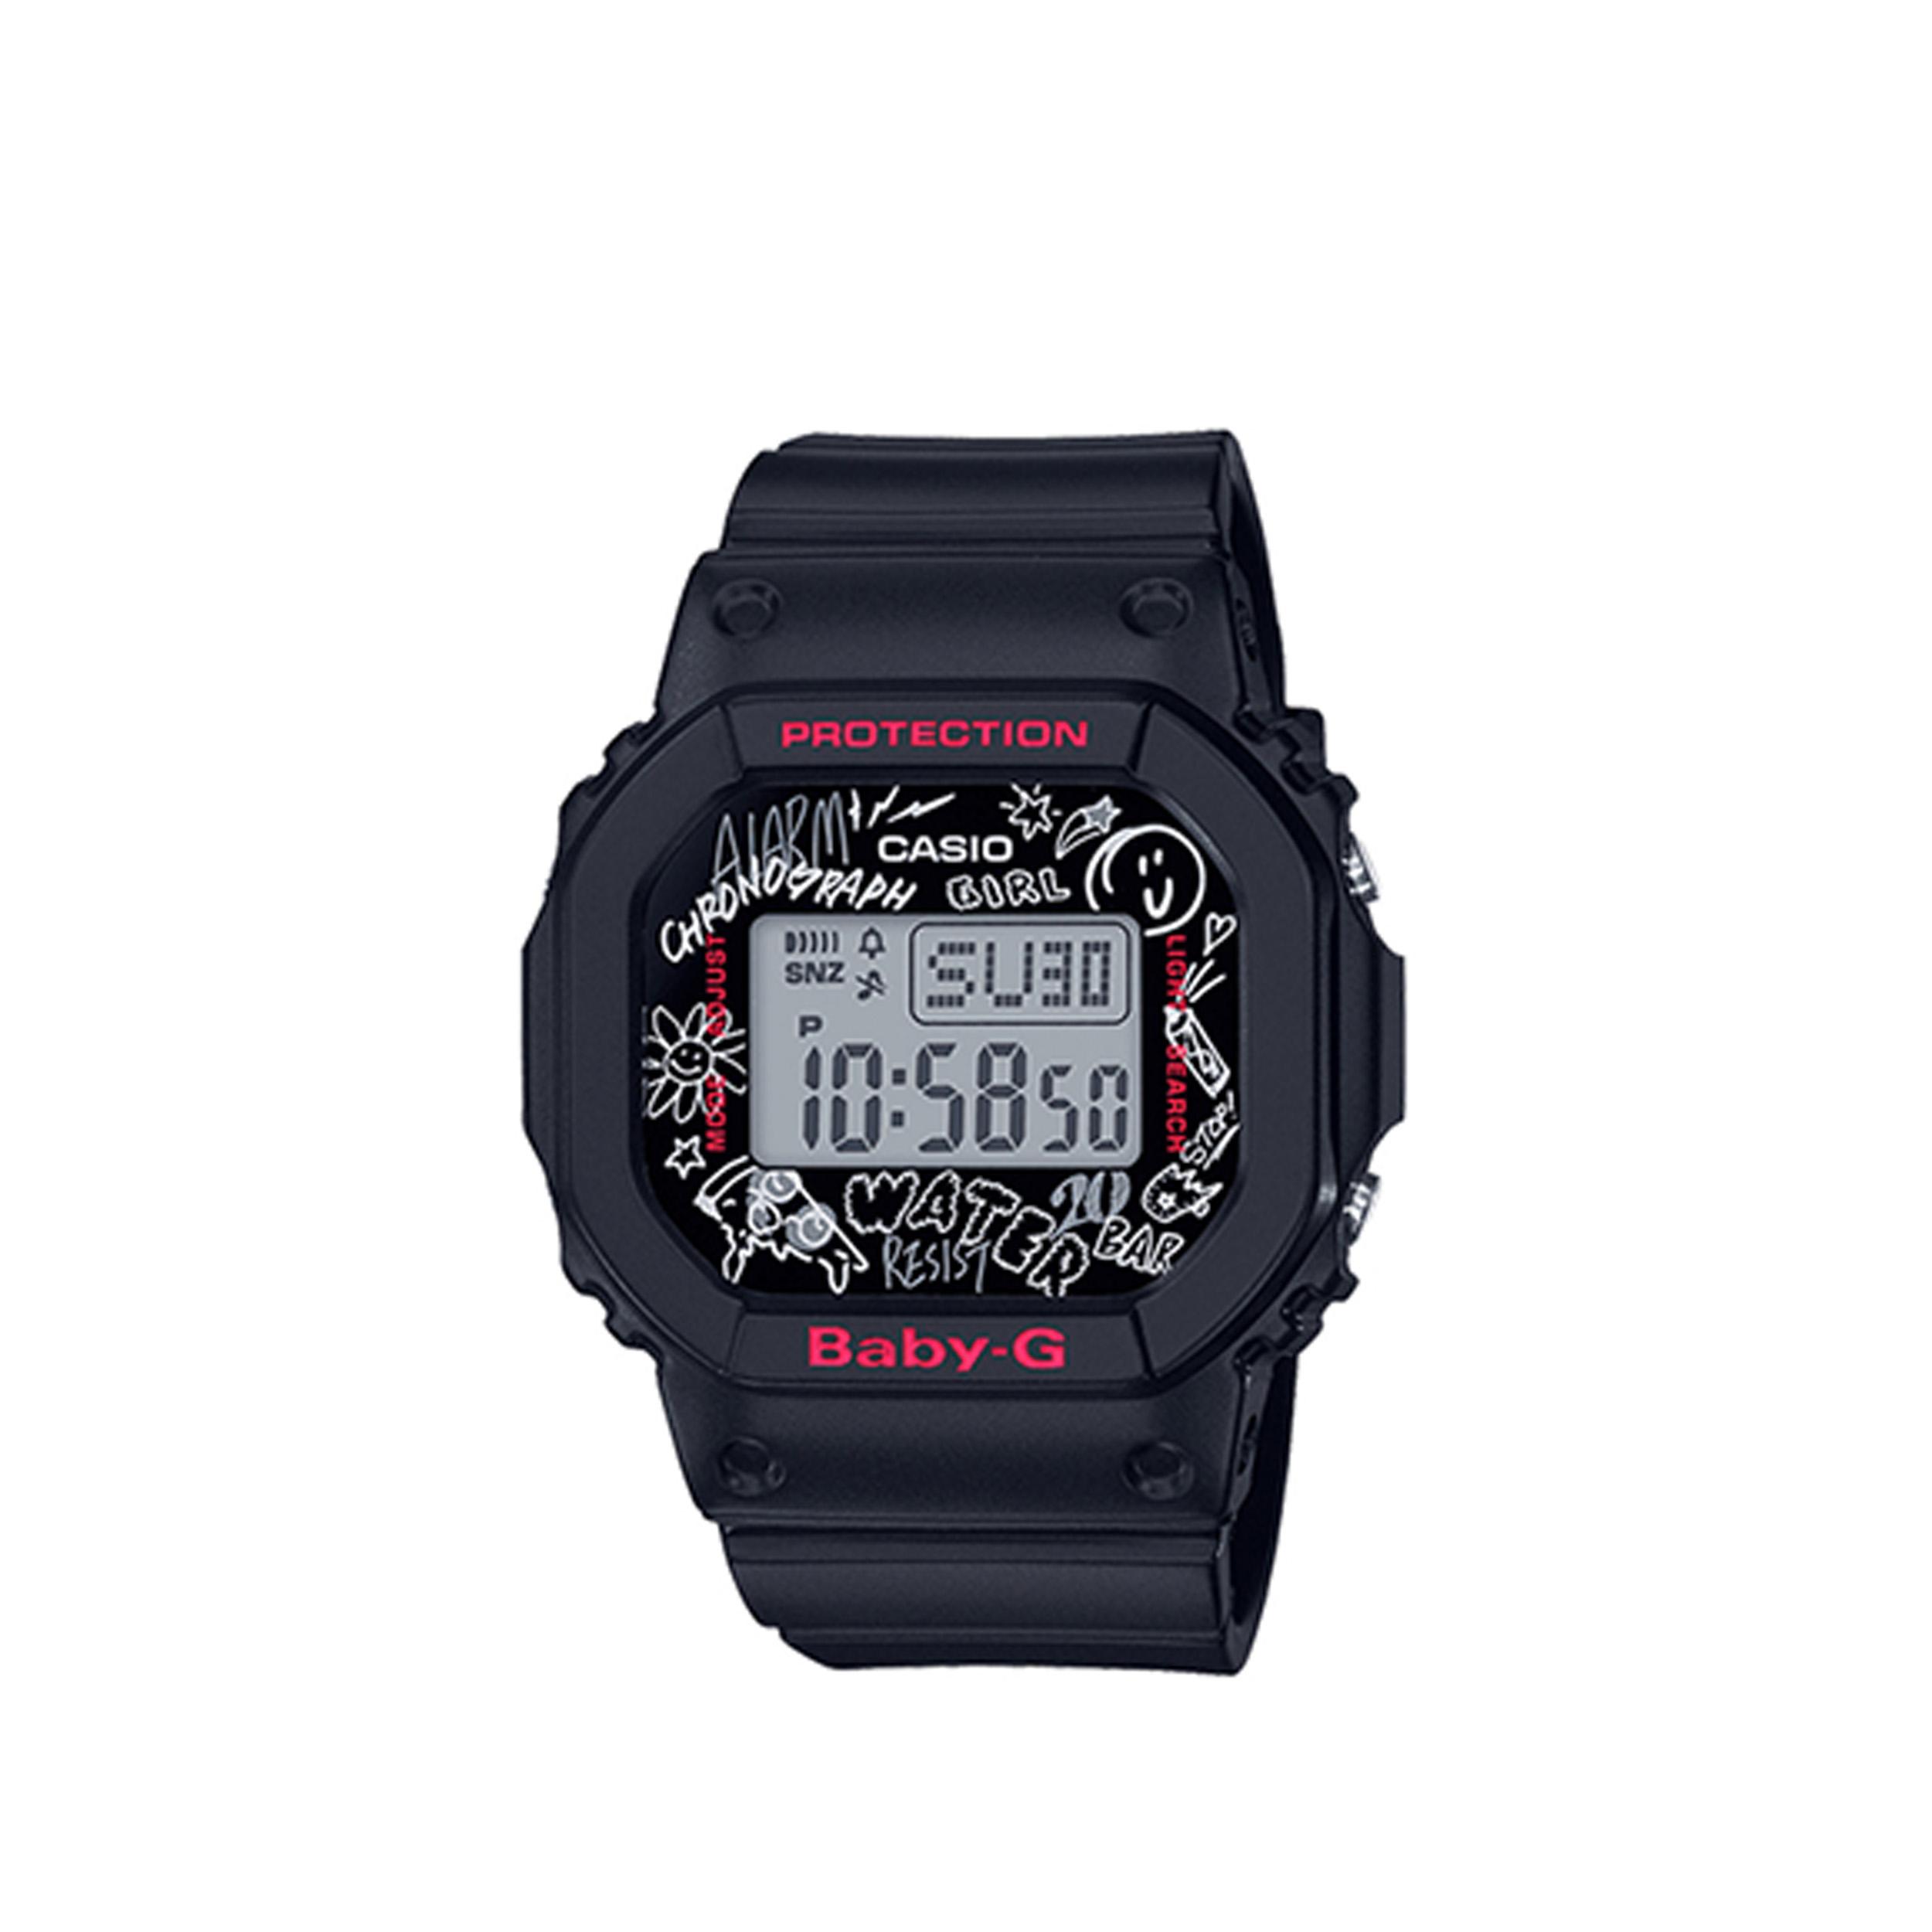 ساعت مچی دیجیتالی زنانه کاسیو مدل BGD-560SK-1DR